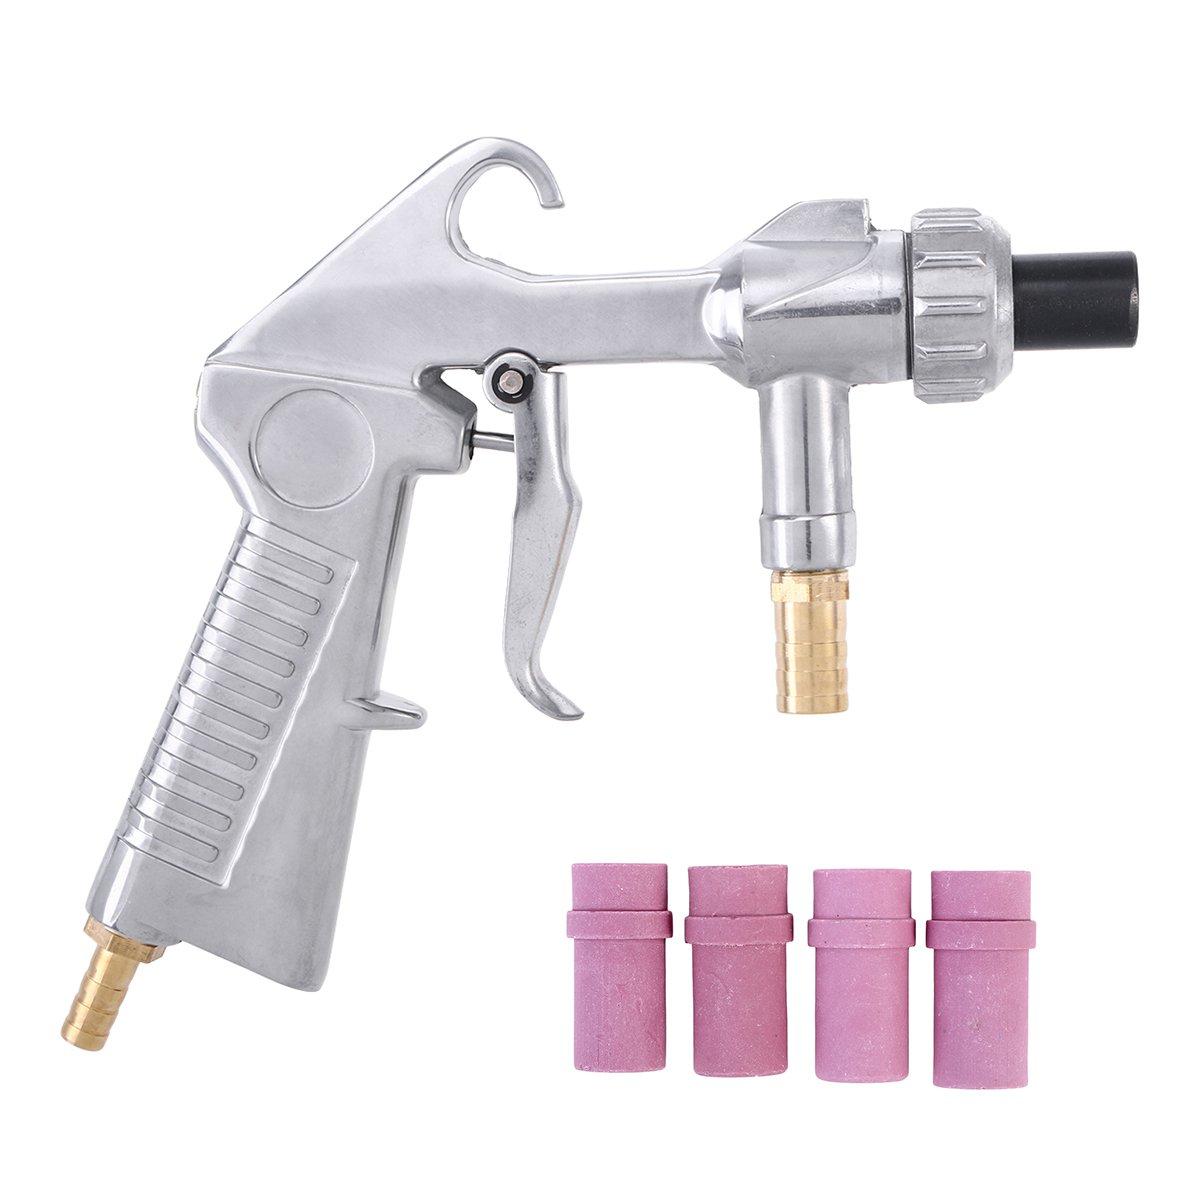 UKCOCO Sandblaster Air Siphon Nozzle Sand Blasting with 4 Ceramic Nozzles Kit